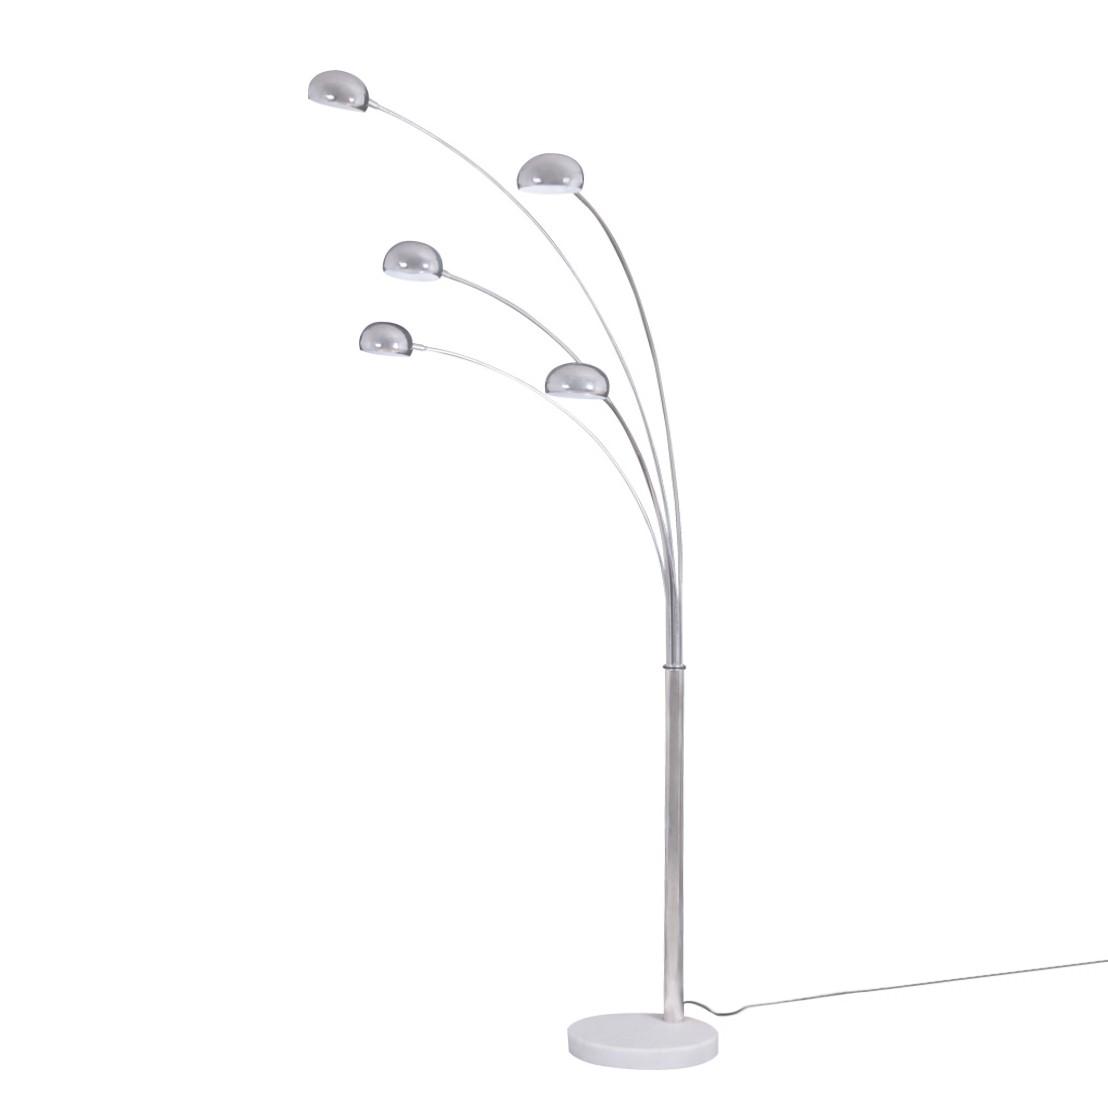 EEK A++, Lampadaire Mignolo - Métal / Marbre - 5 ampoules, Loistaa